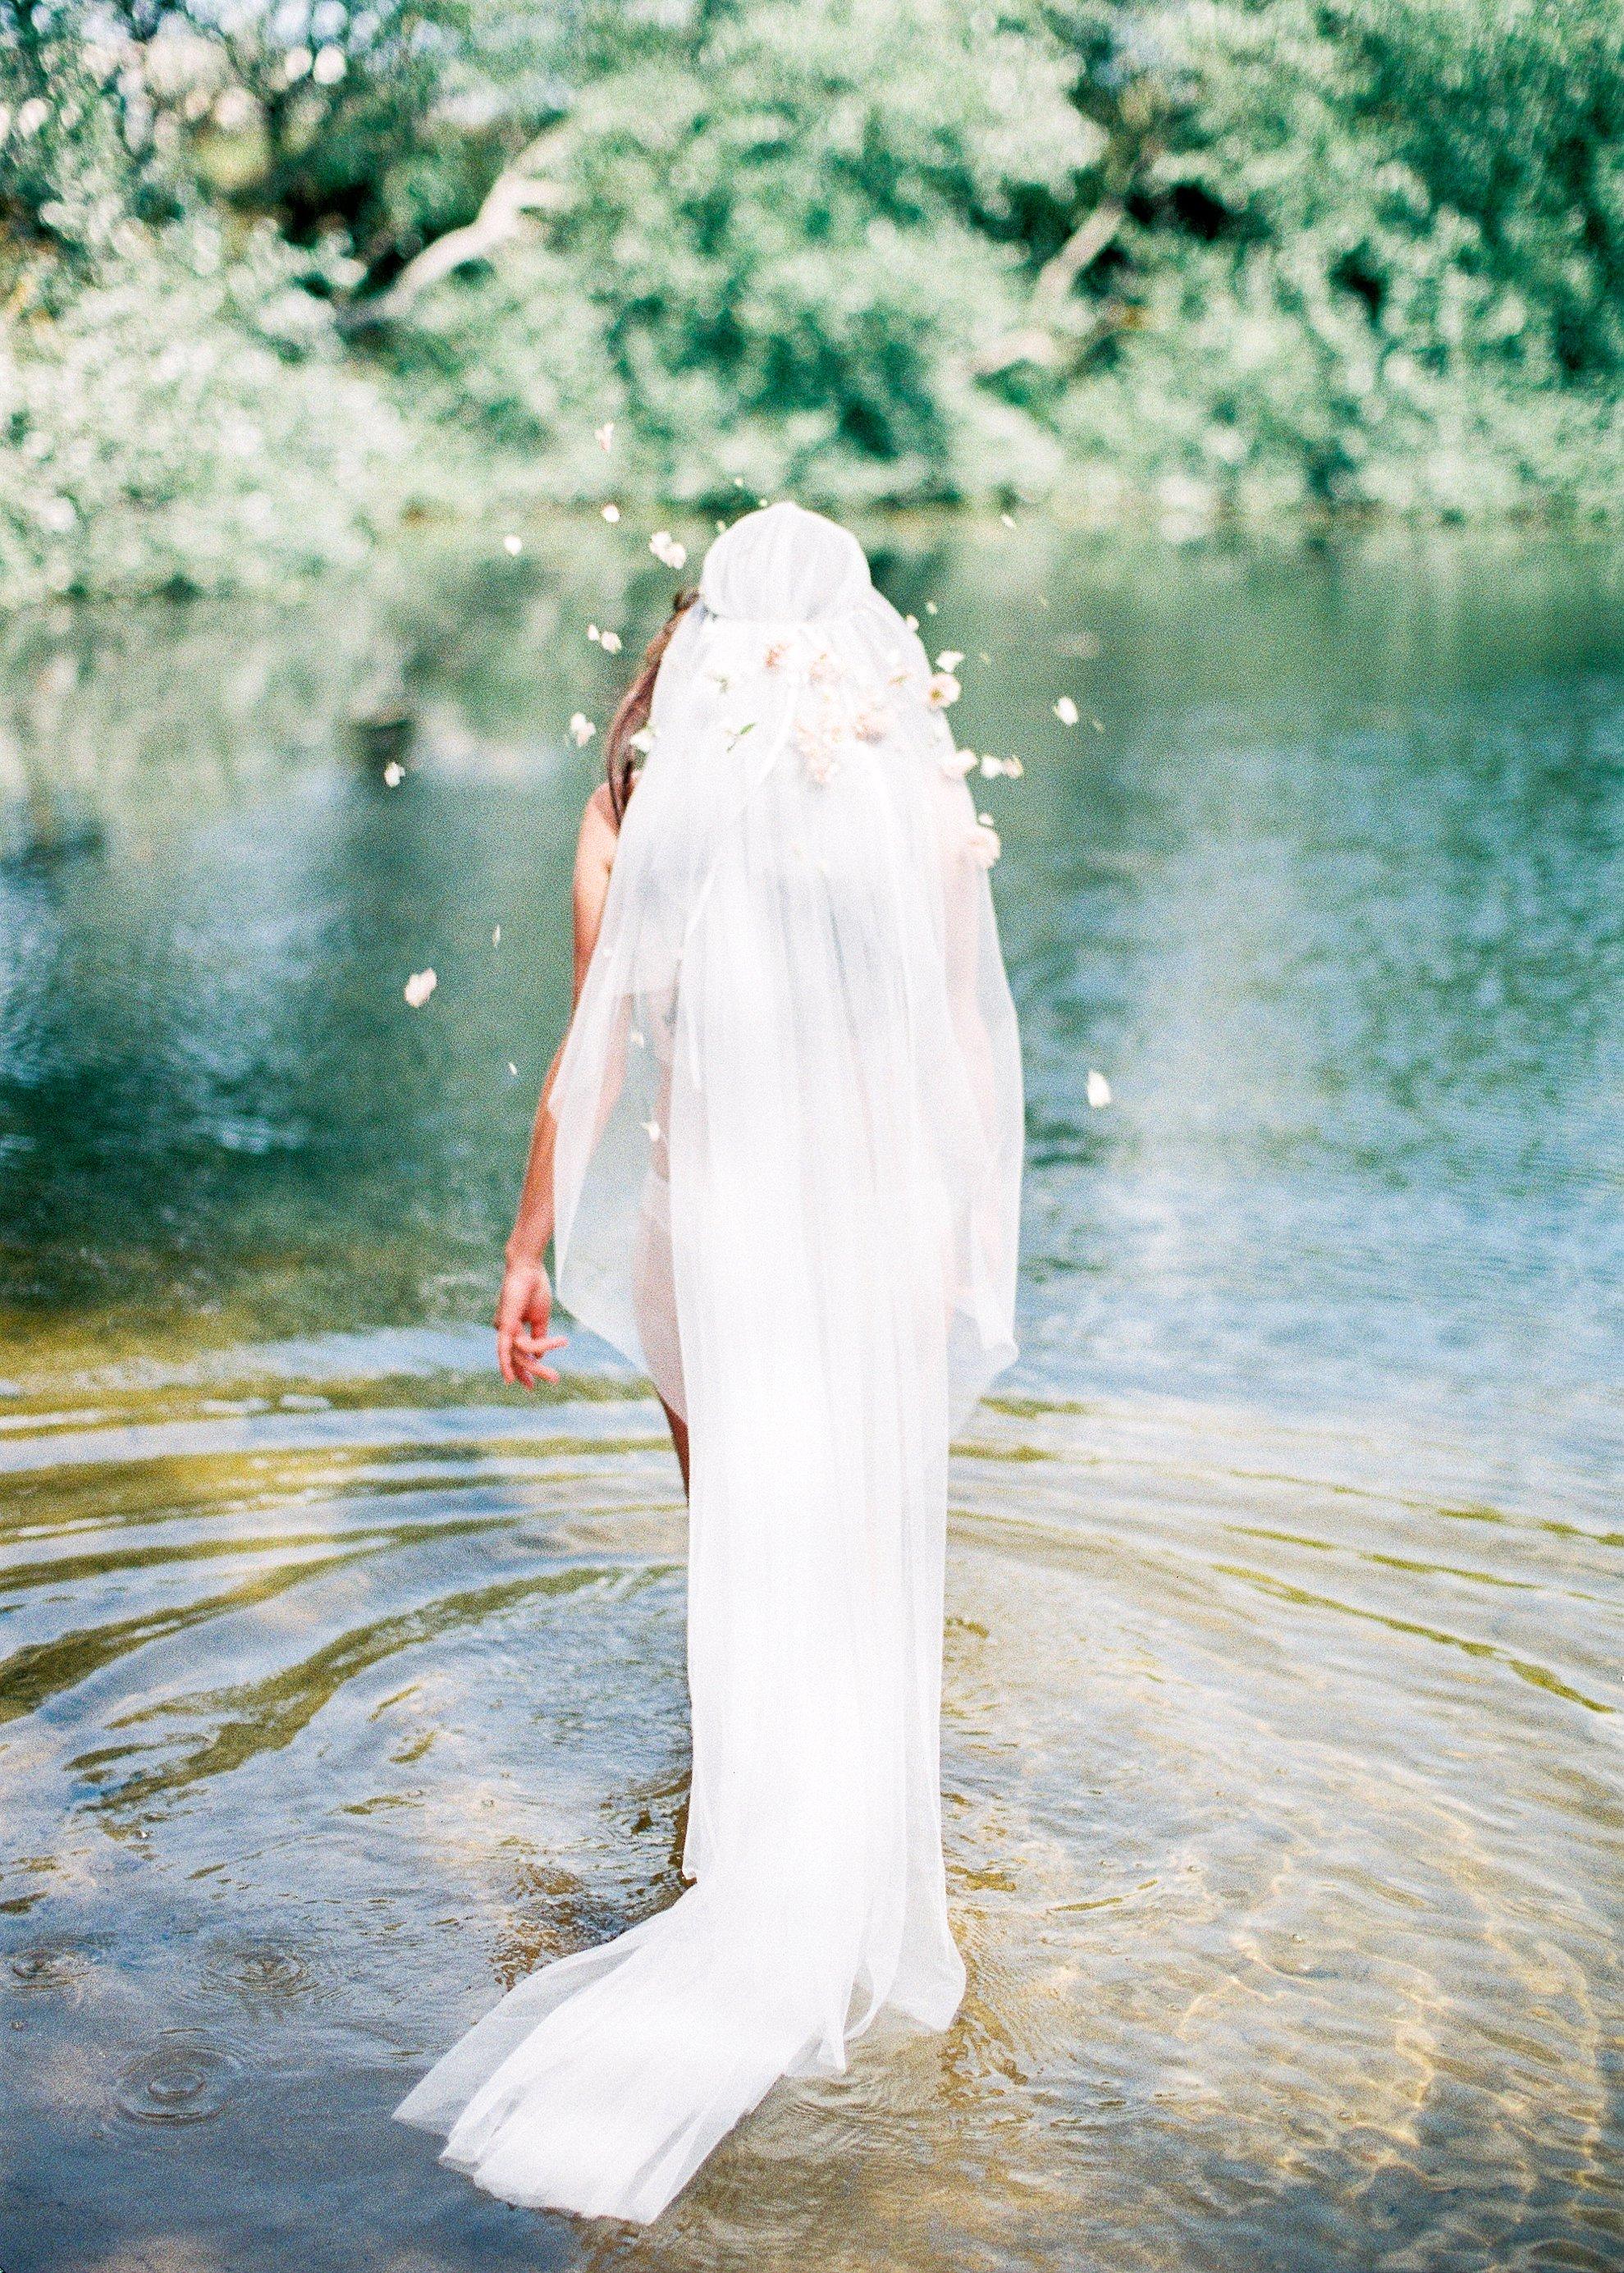 Amanda-Drost-Photography-Fine-Art-Nederland00004.jpg